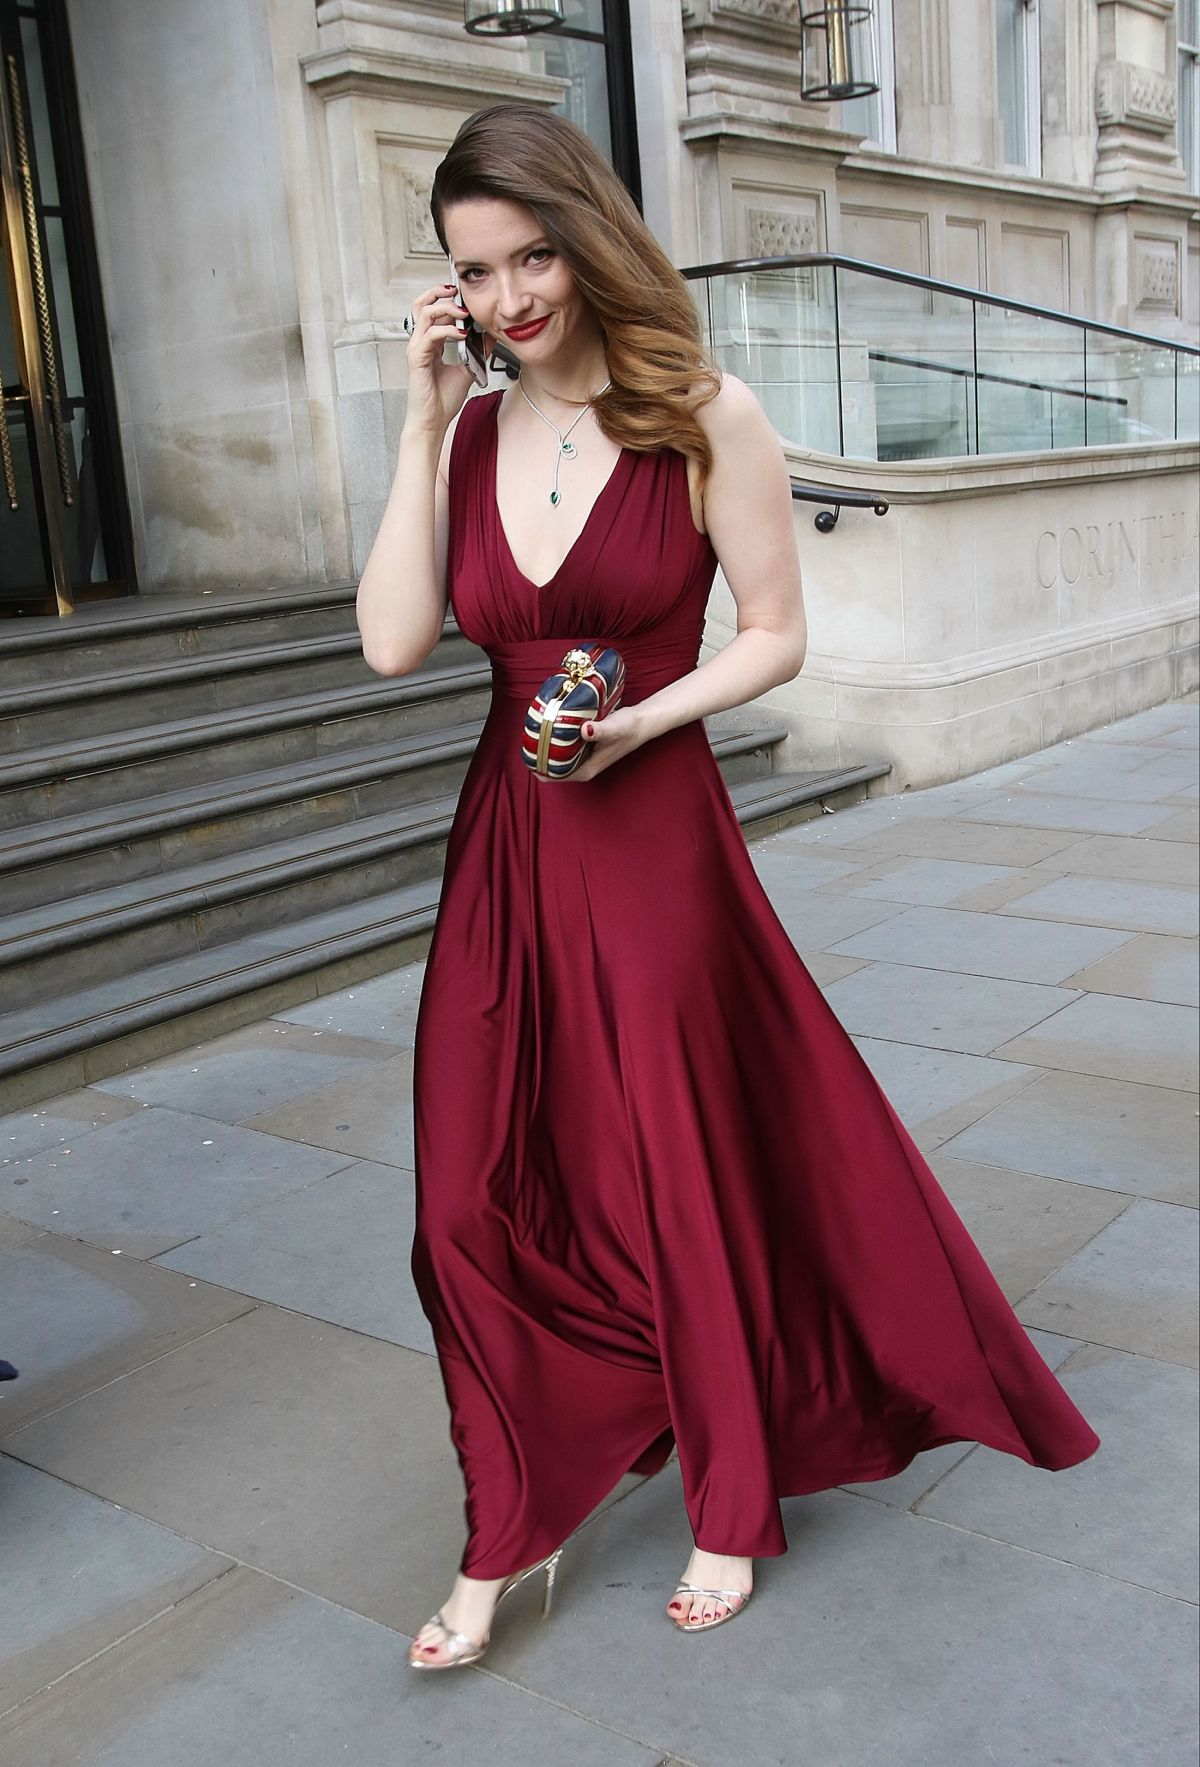 [Image: talulah-riley-at-bafta-2015-awards-in-london_10.jpg]